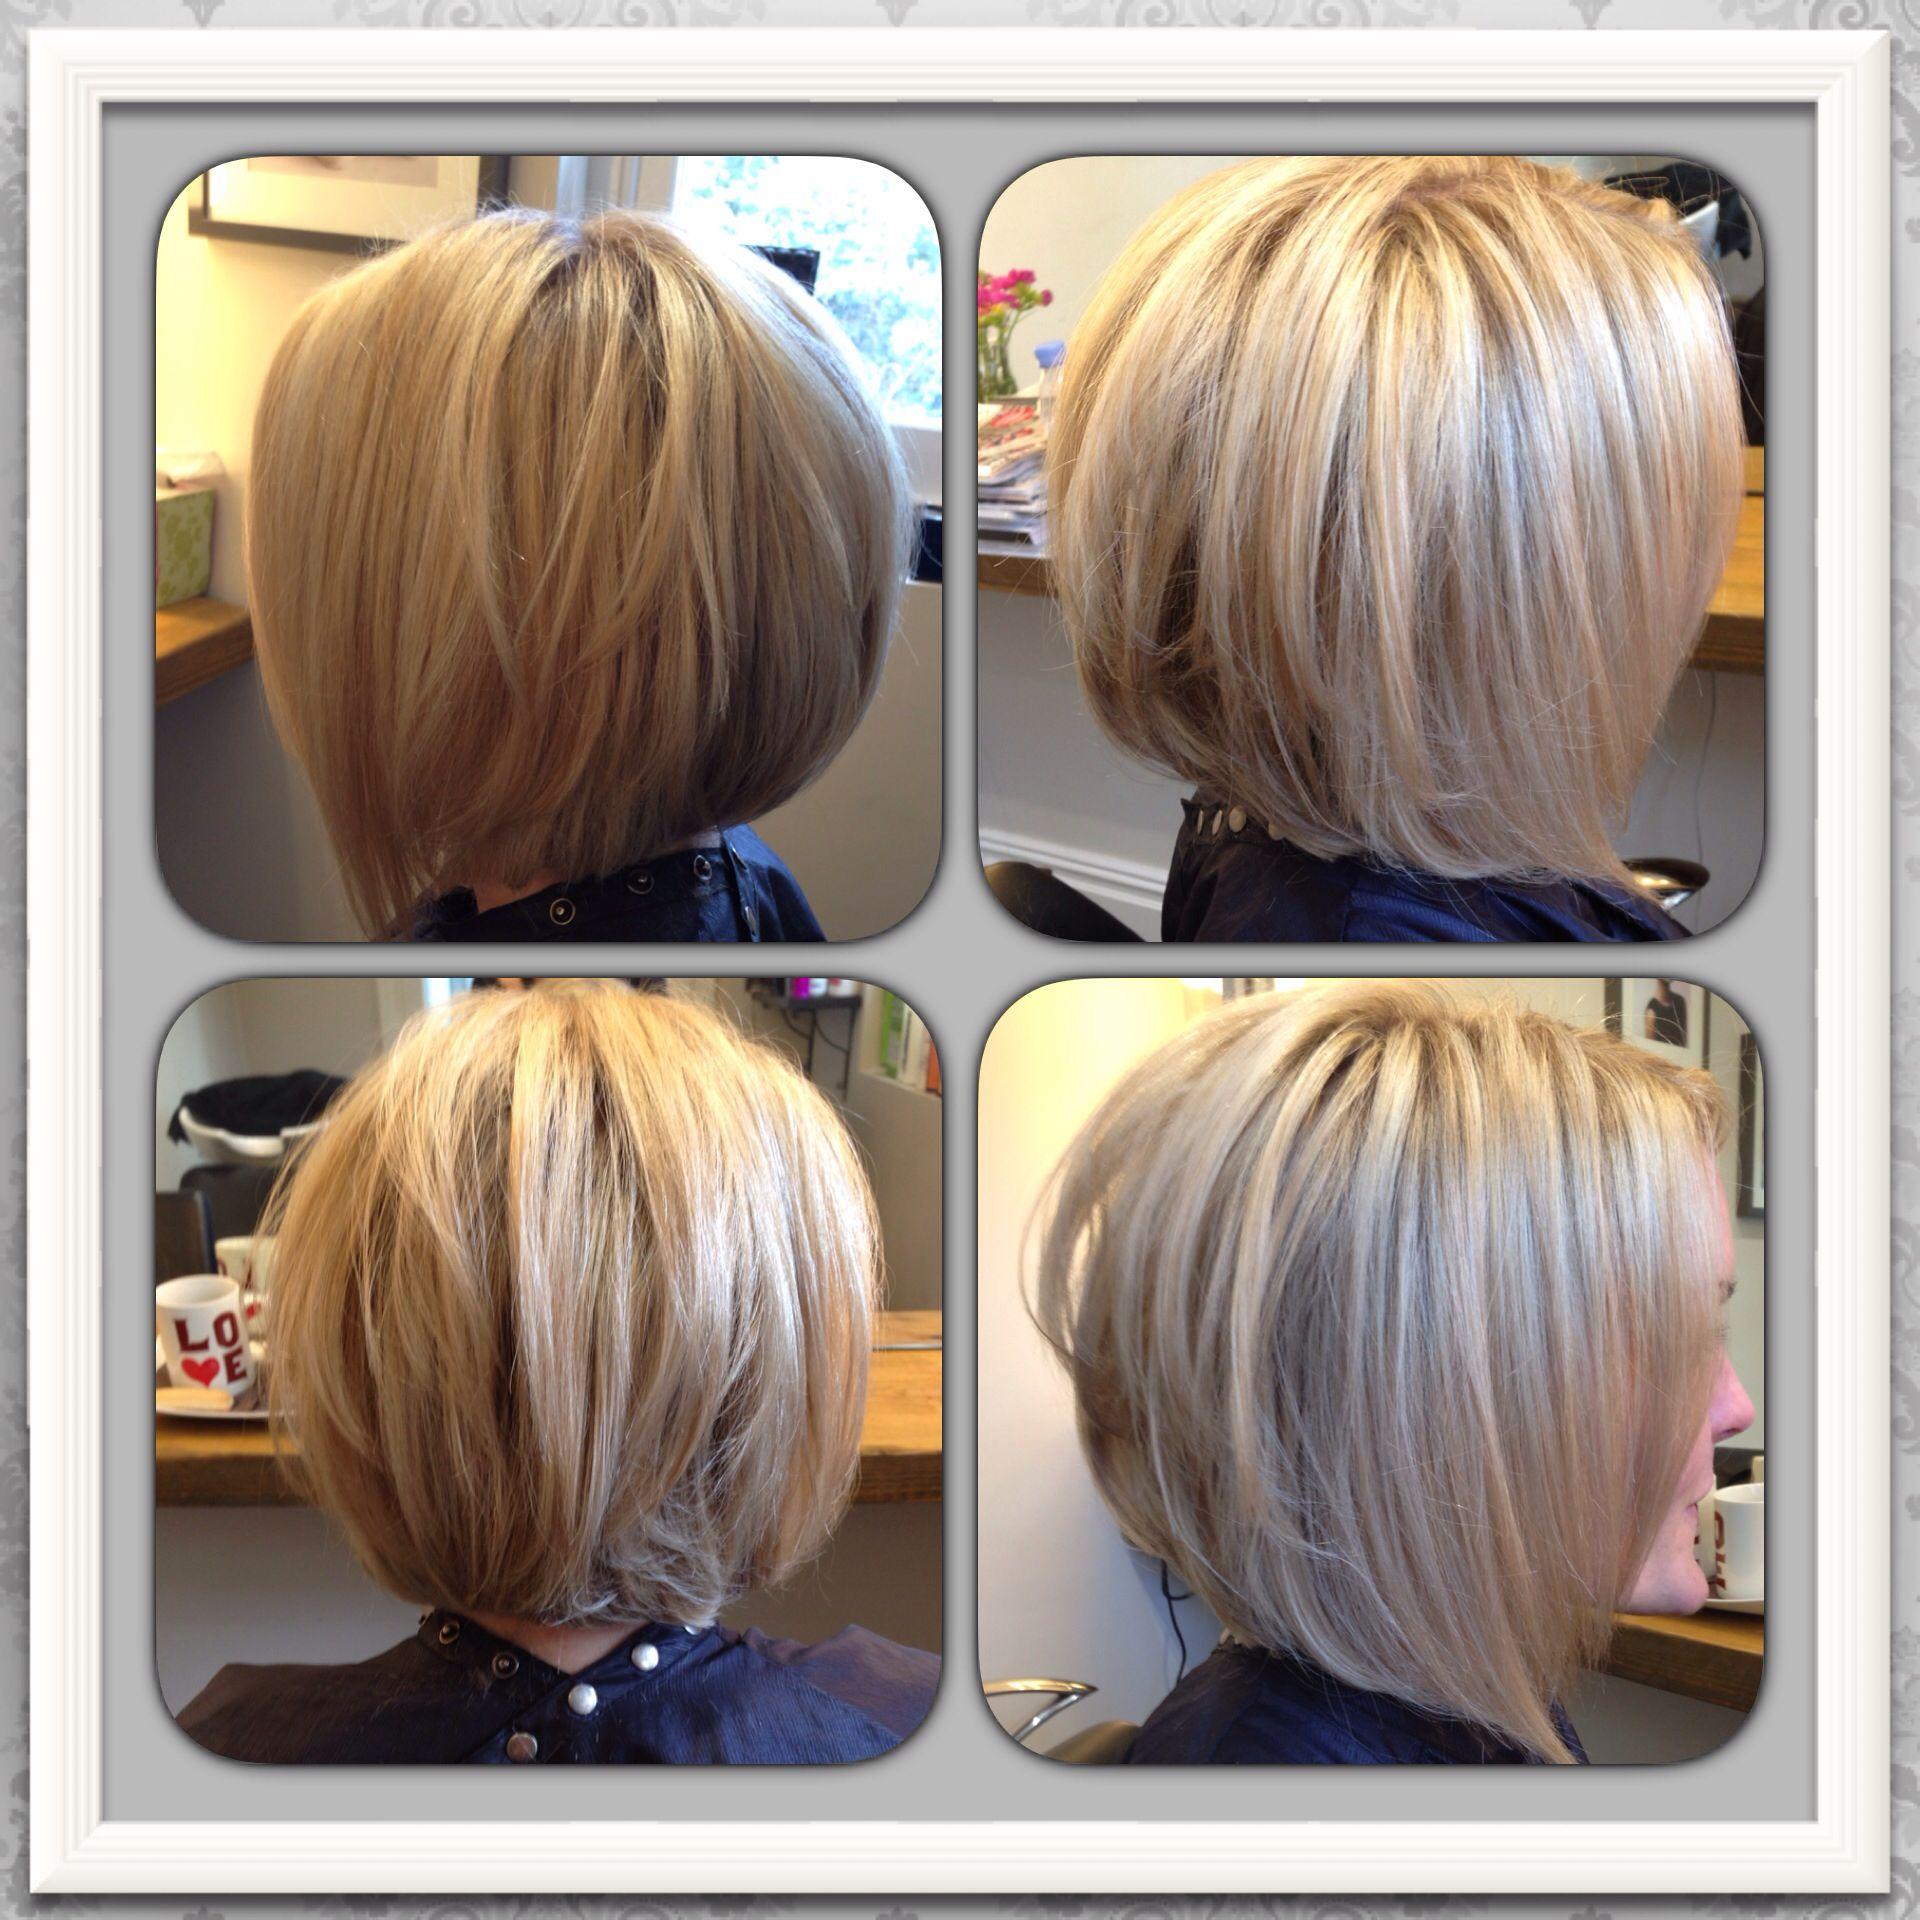 Pin By Kaymaree Hader On Bob 2 Short Hair Styles Hair Styles Blonde Hair With Highlights